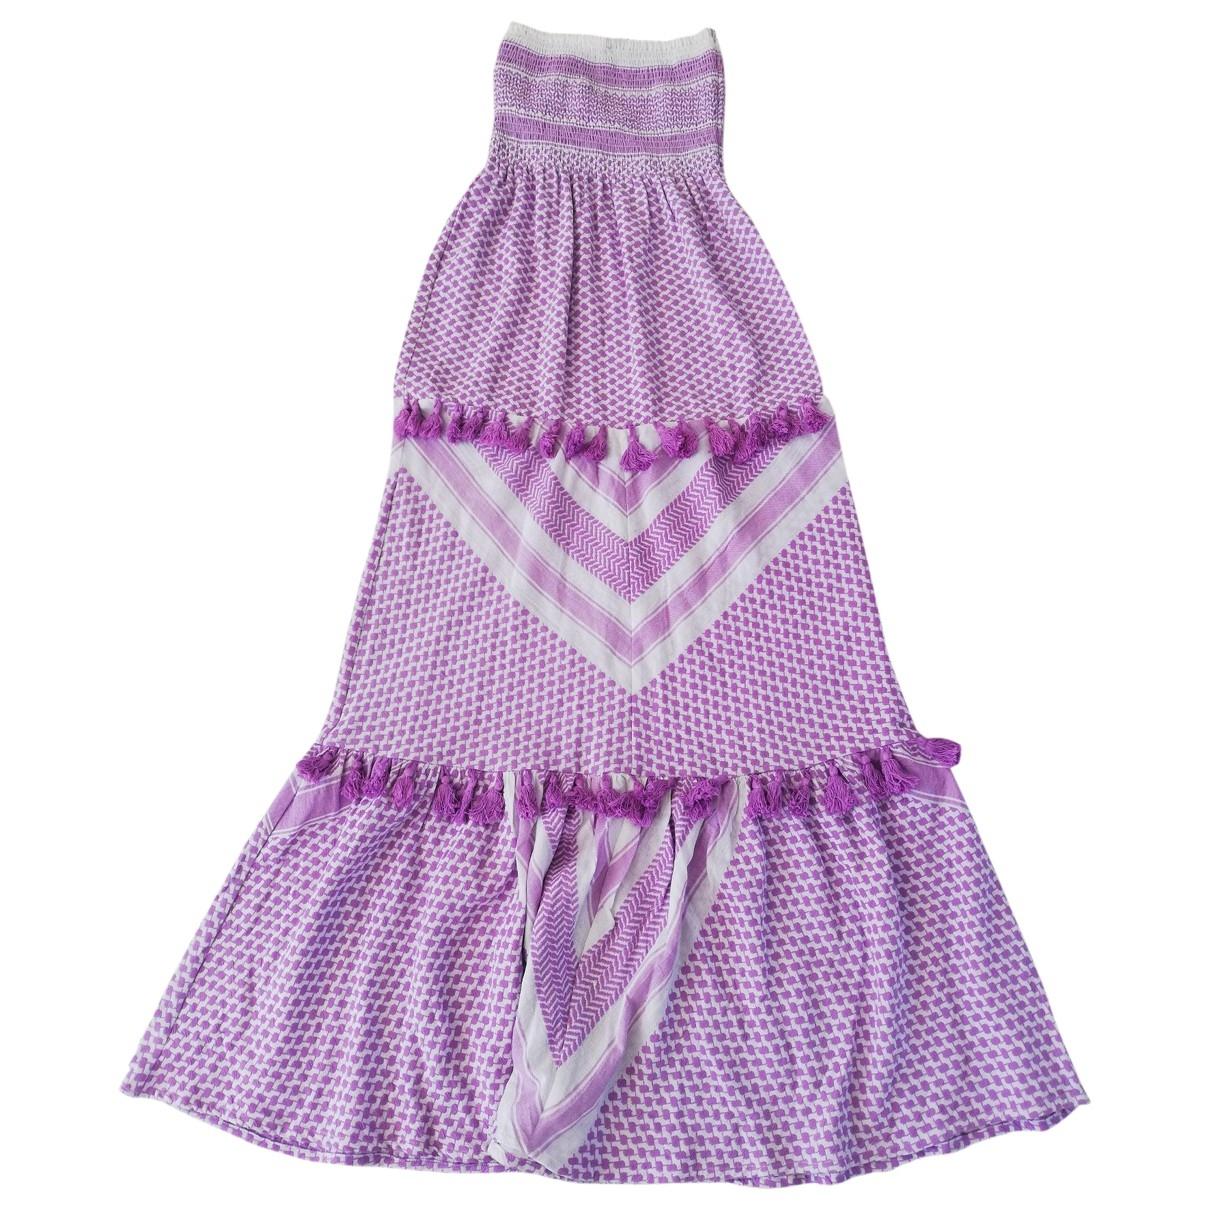 Cecilie Copenhagen \N Purple Cotton dress for Women S International